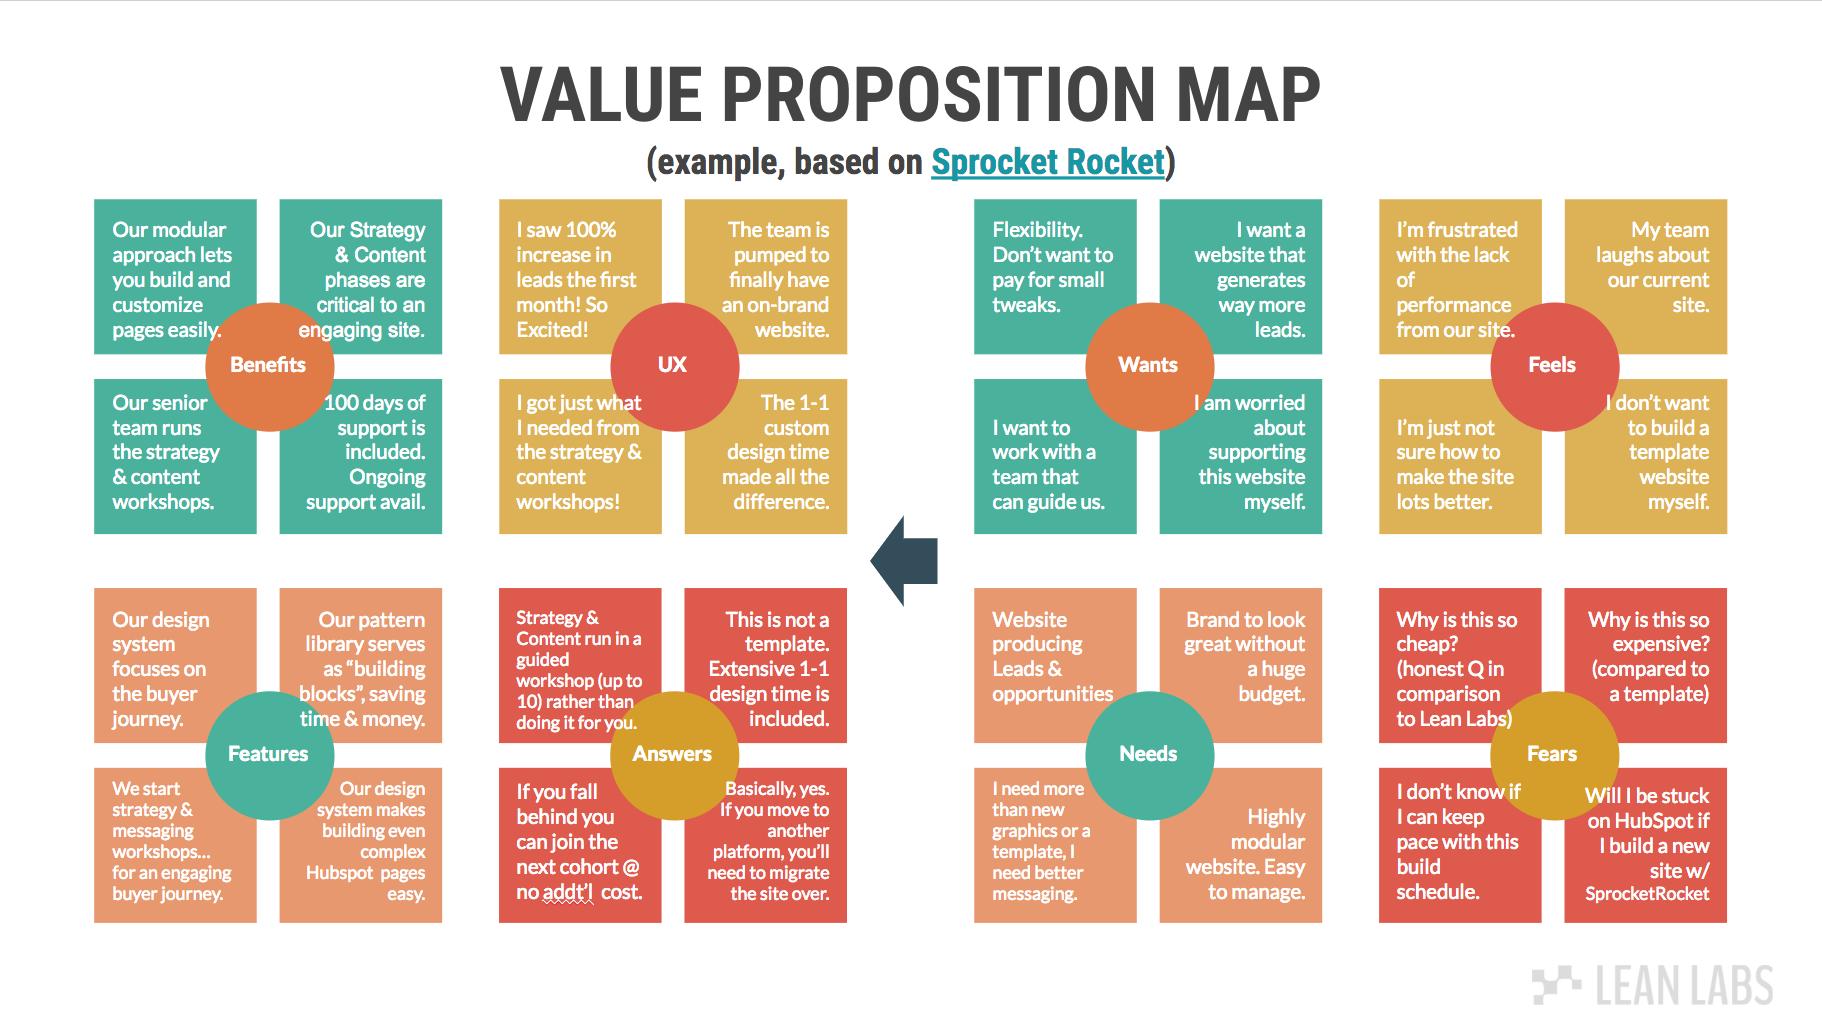 Value Proposition Map